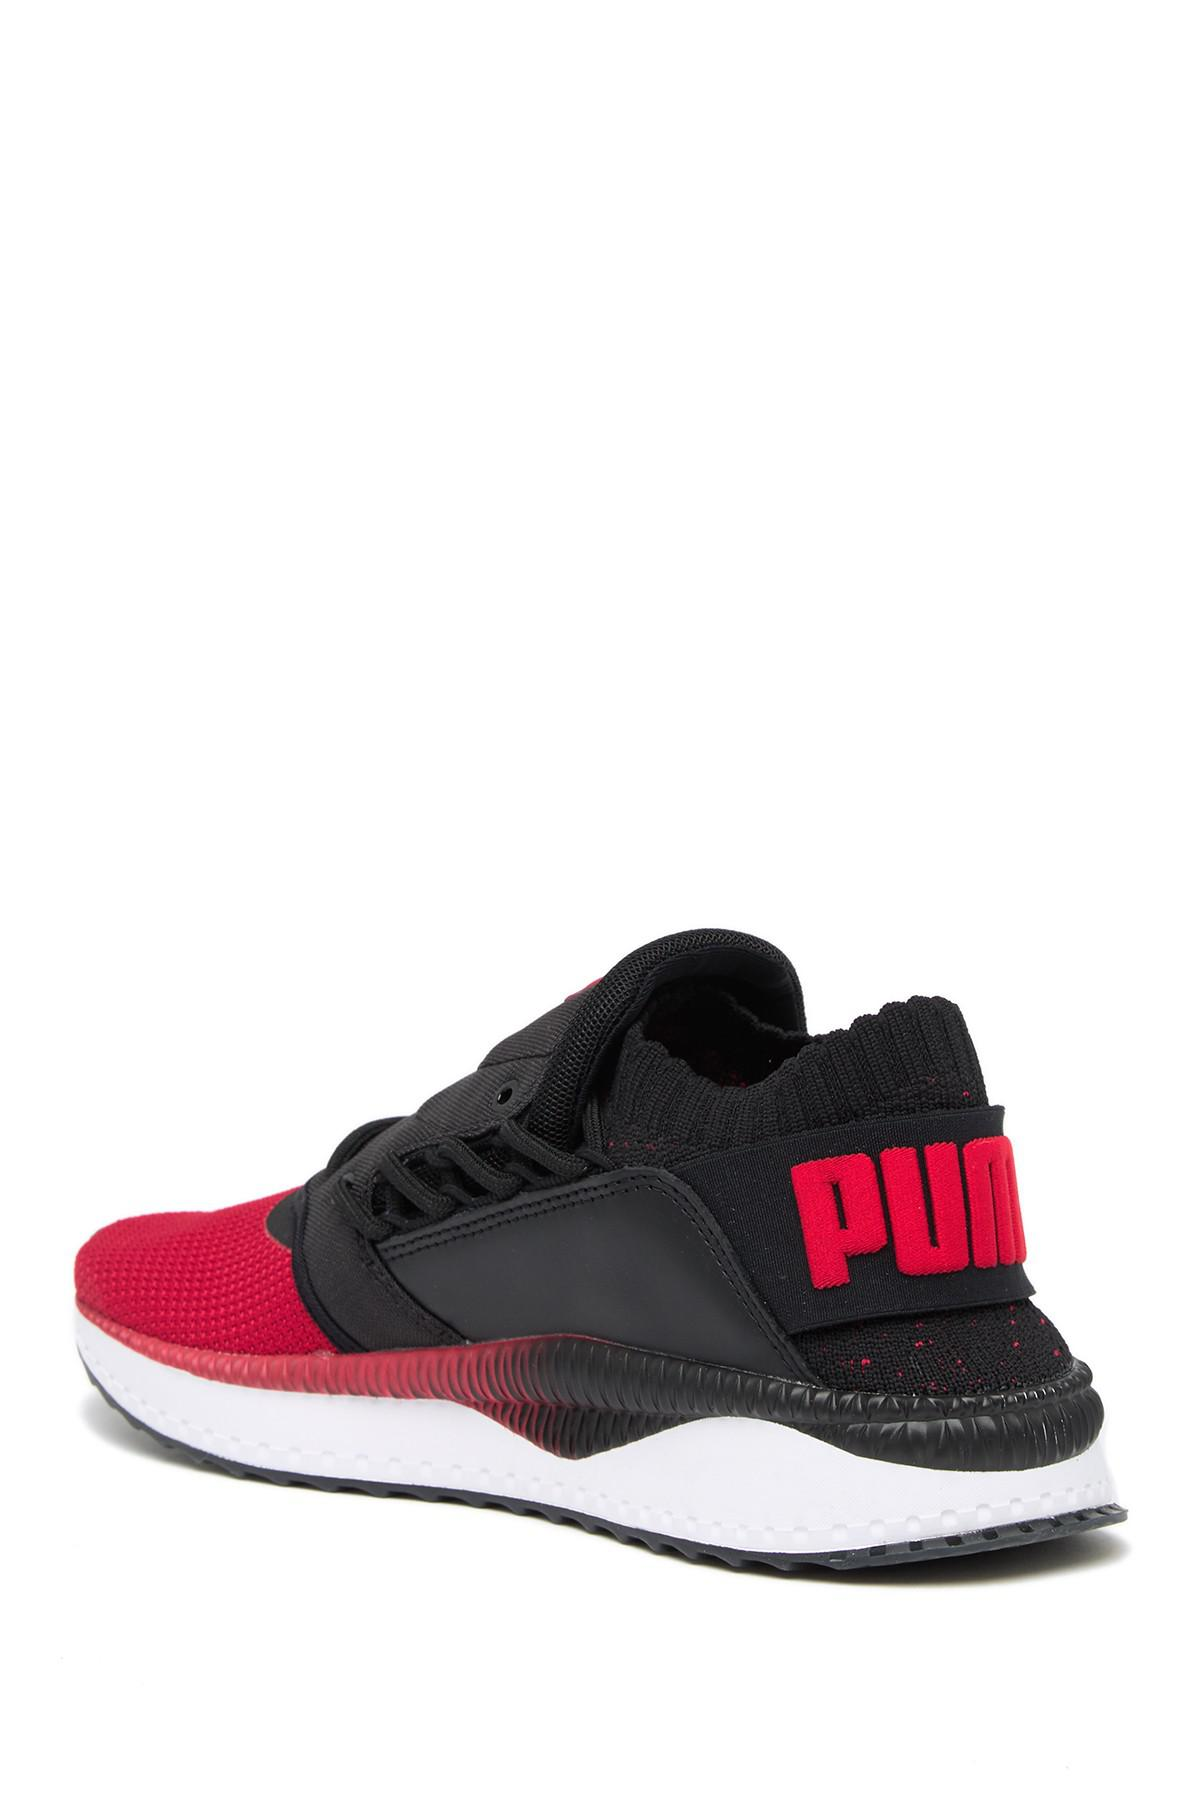 PUMA - Black Tsugi Shinsei Nido Athletic Leather Sneaker for Men - Lyst.  View fullscreen da819a5ab